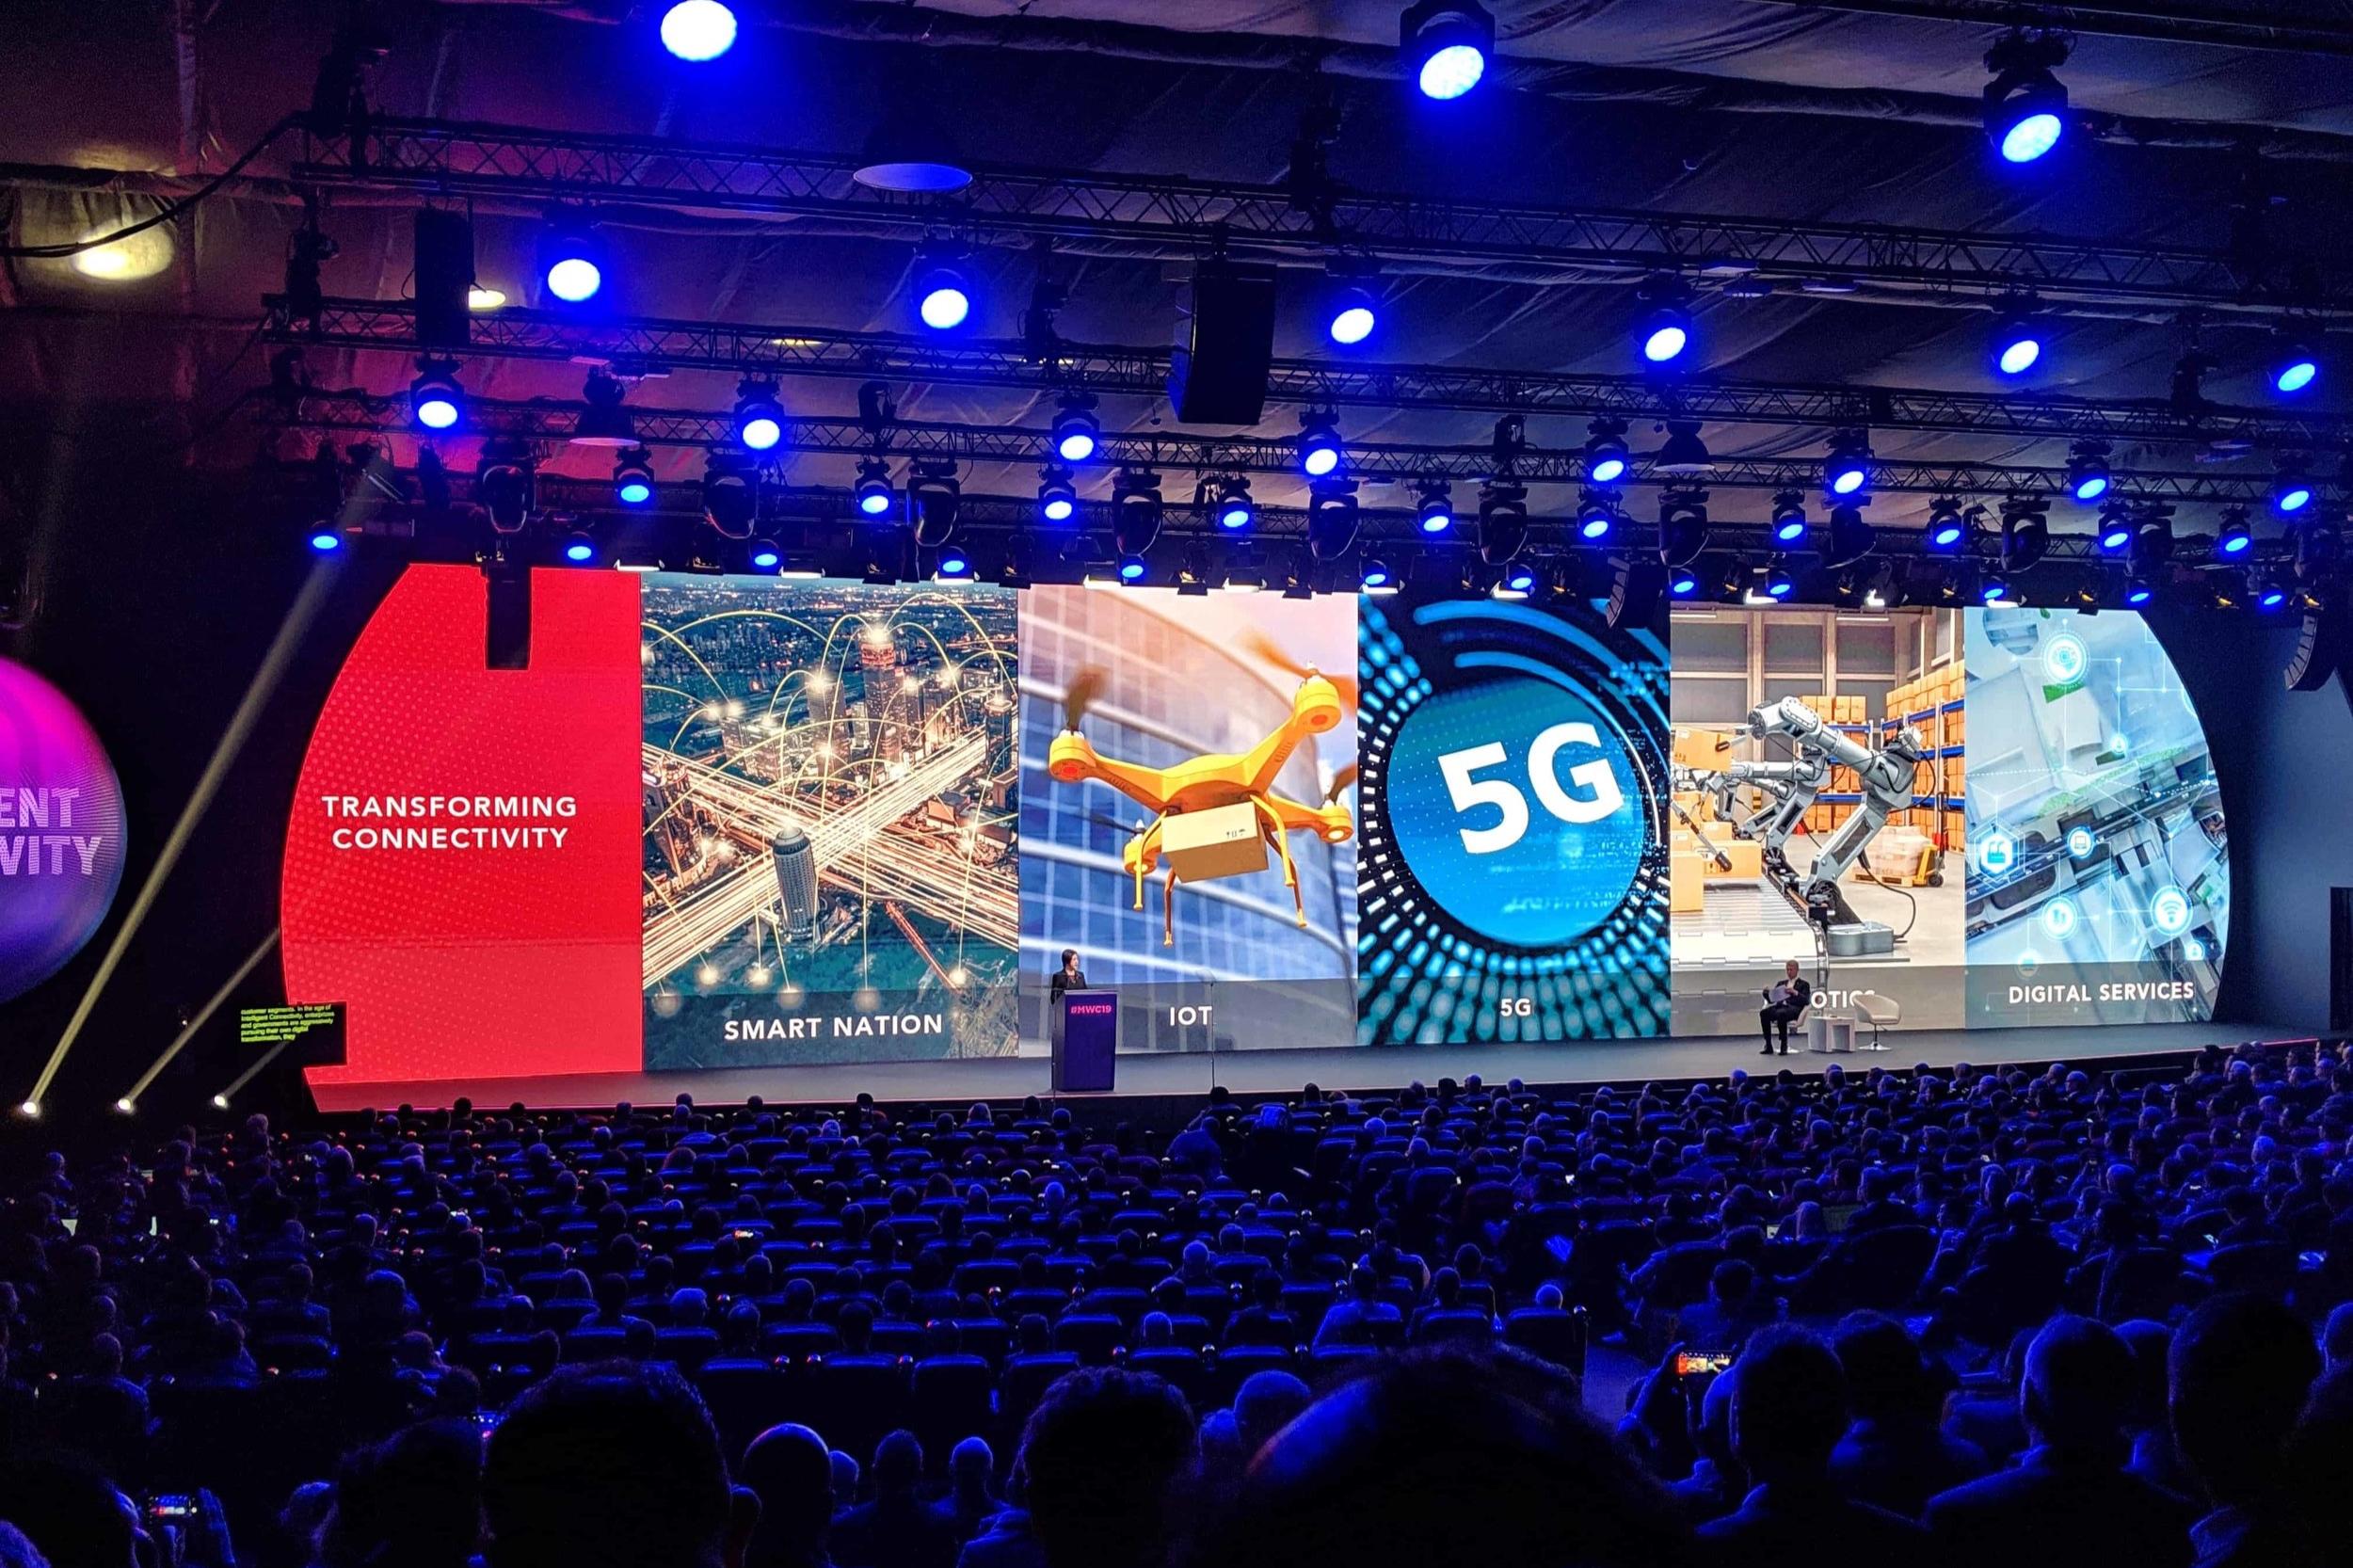 Intelligent connectivity - core topics